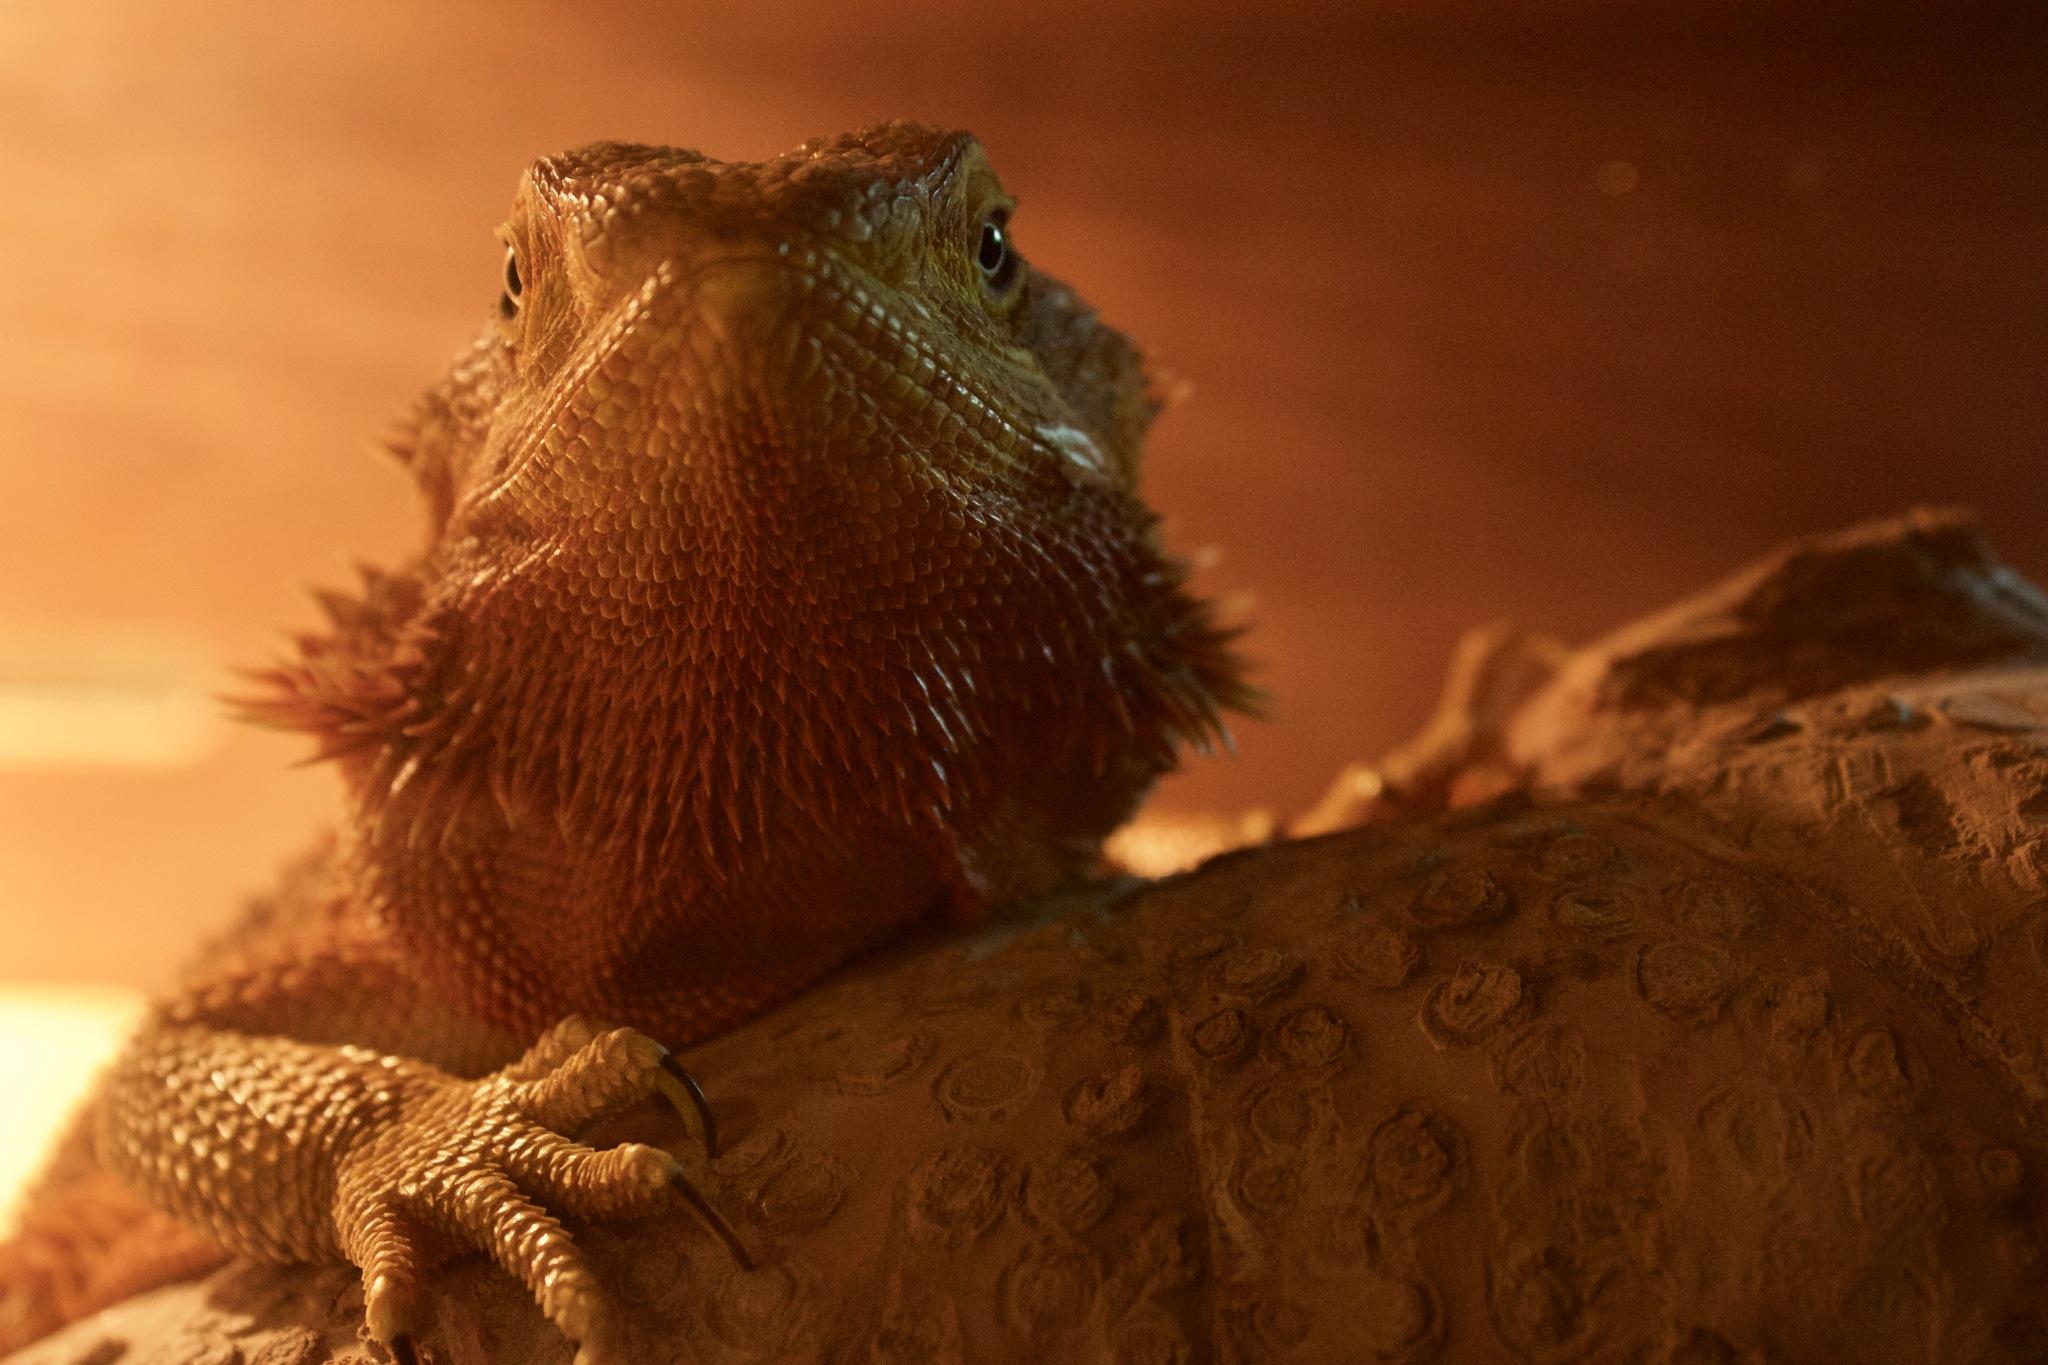 Posing Bearded Dragon #2 by annabelmc